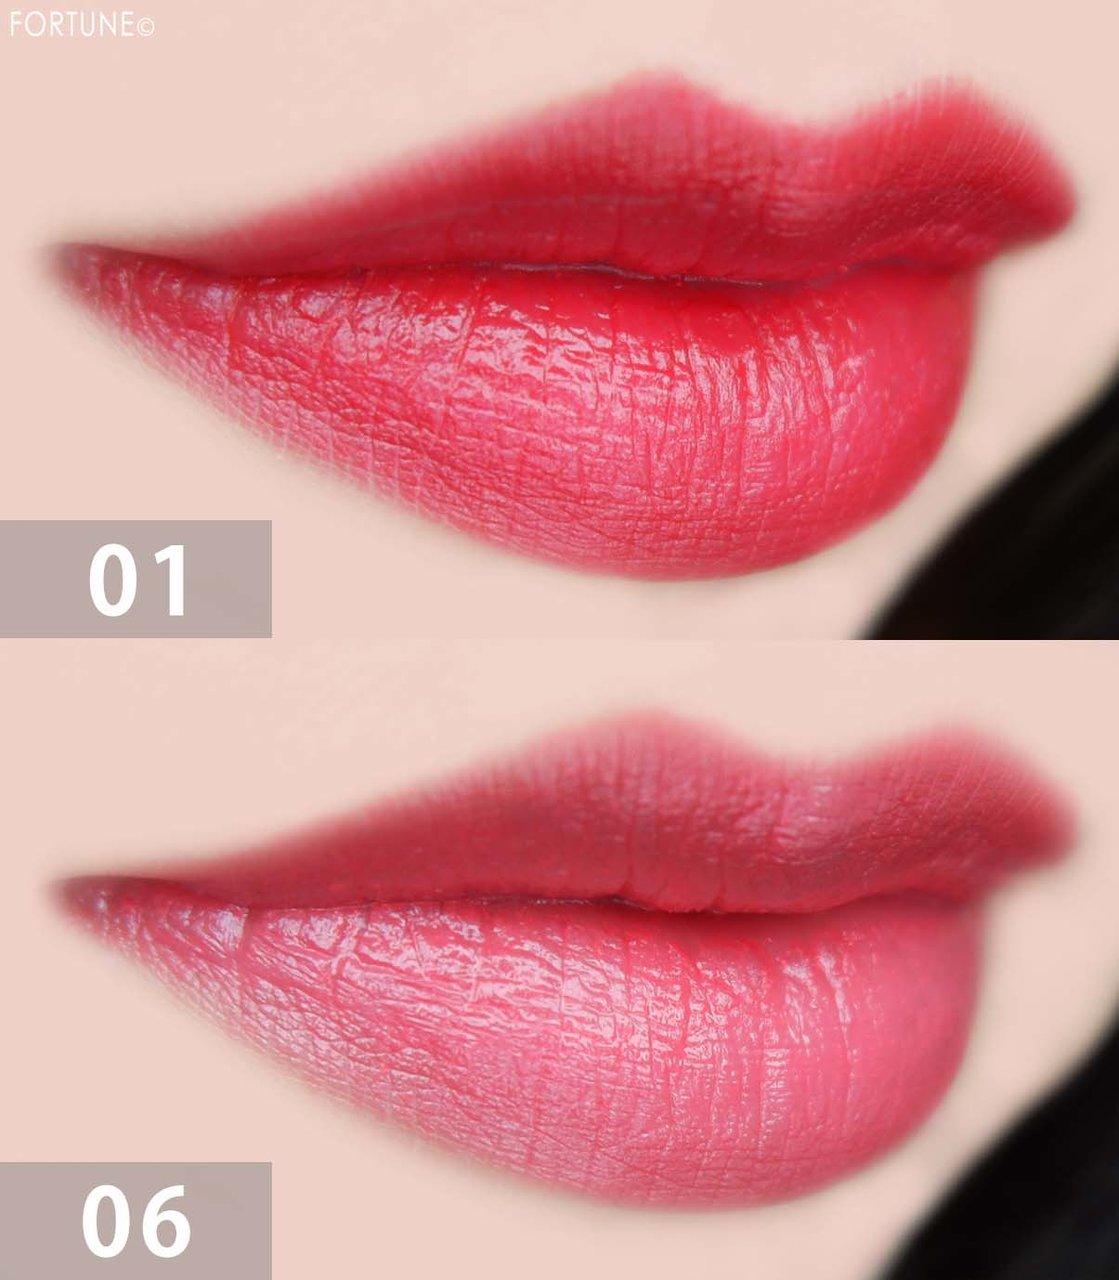 RMKリップコレクション『Color Summer Kiss』 「リップスティック コンフォート マットフィット」「リップスティック コンフォート ブライトリッチ」 使用感